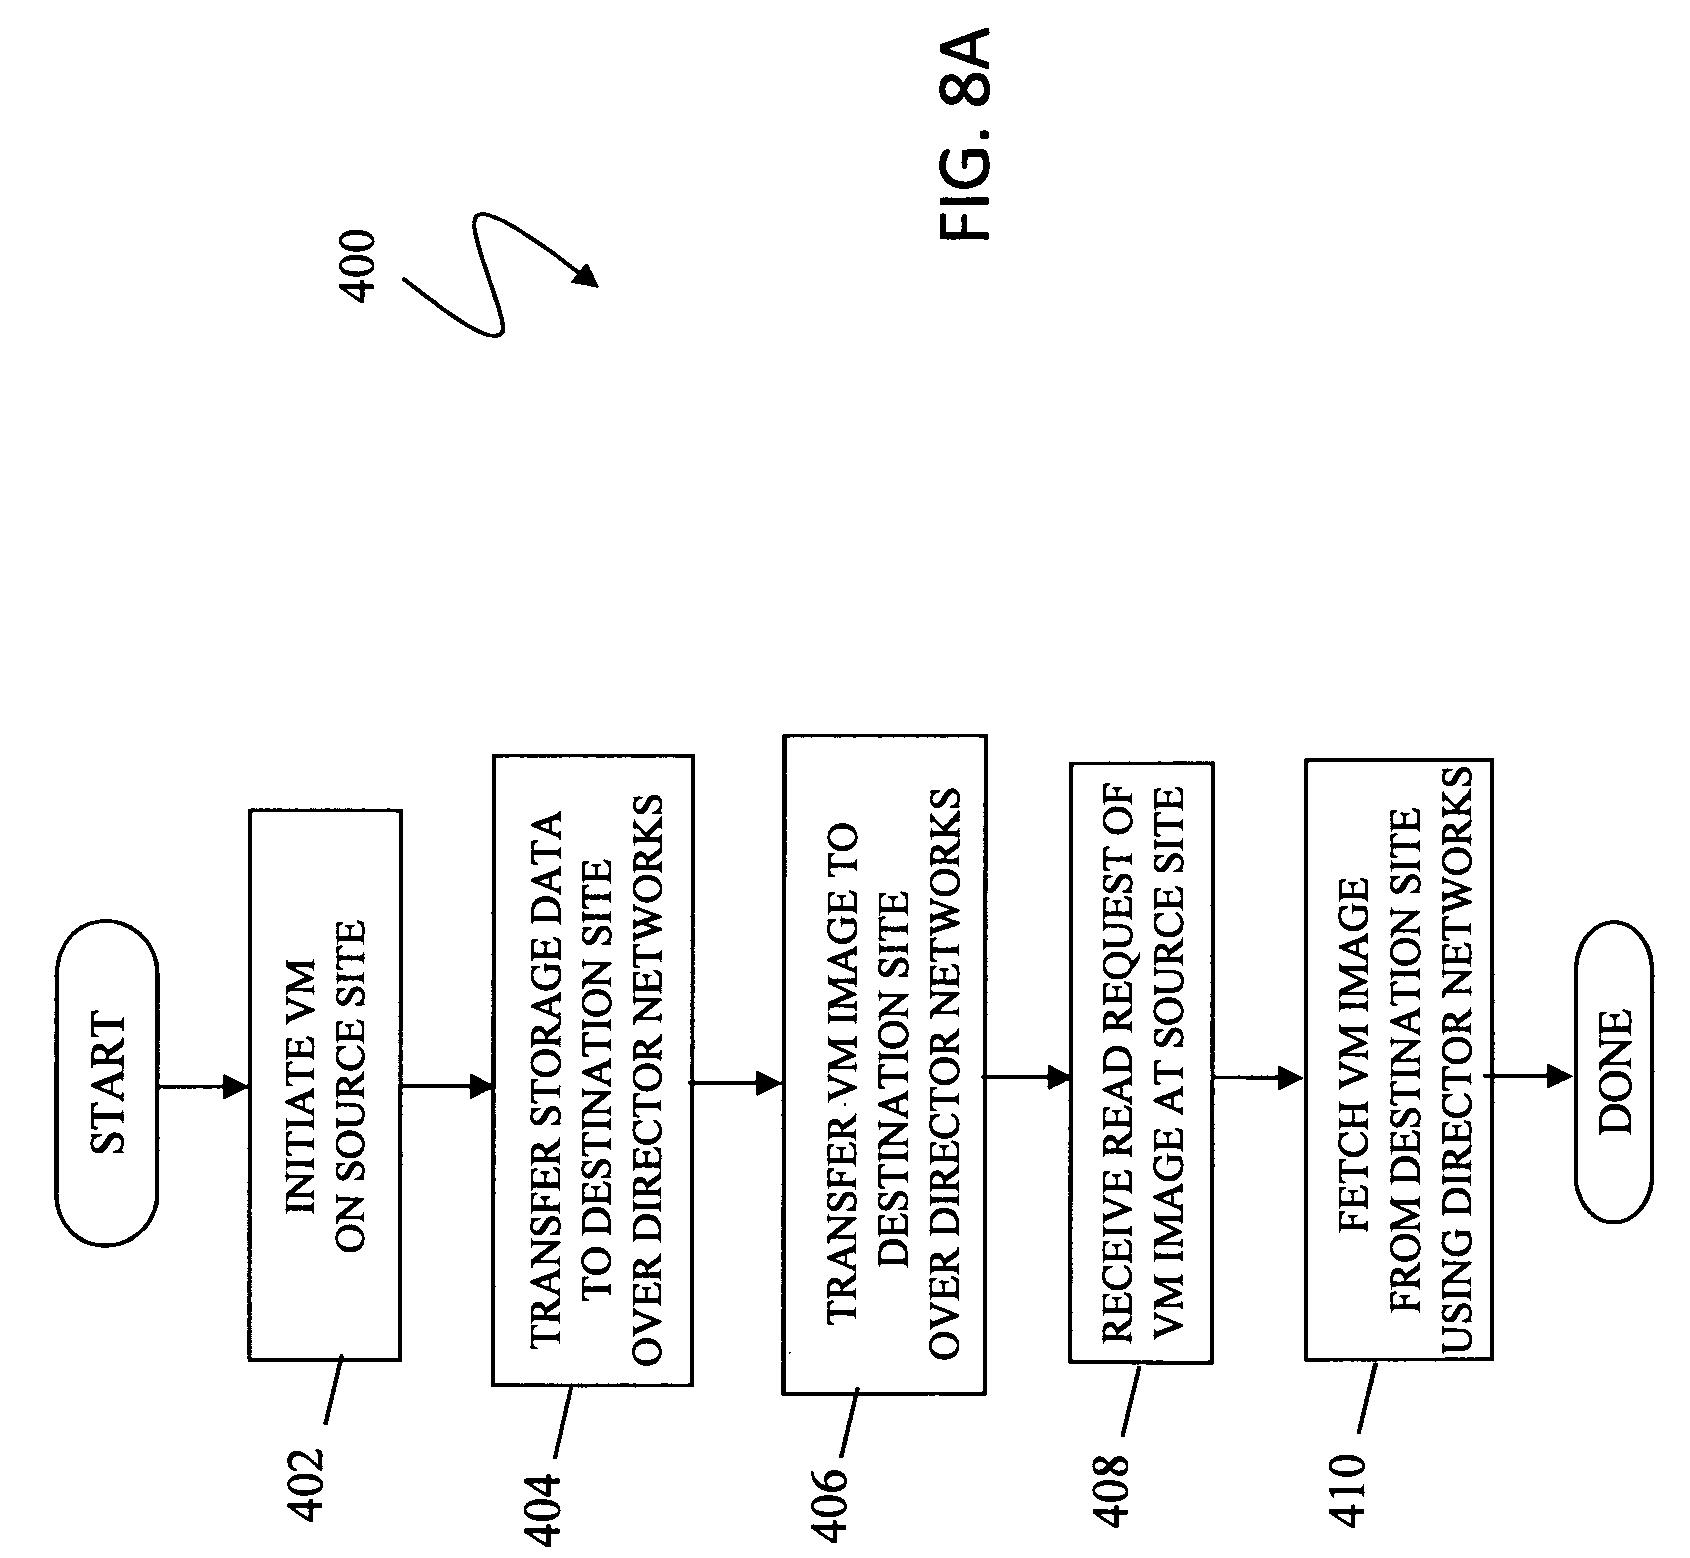 US8667490B1 - Active/active storage and virtual machine